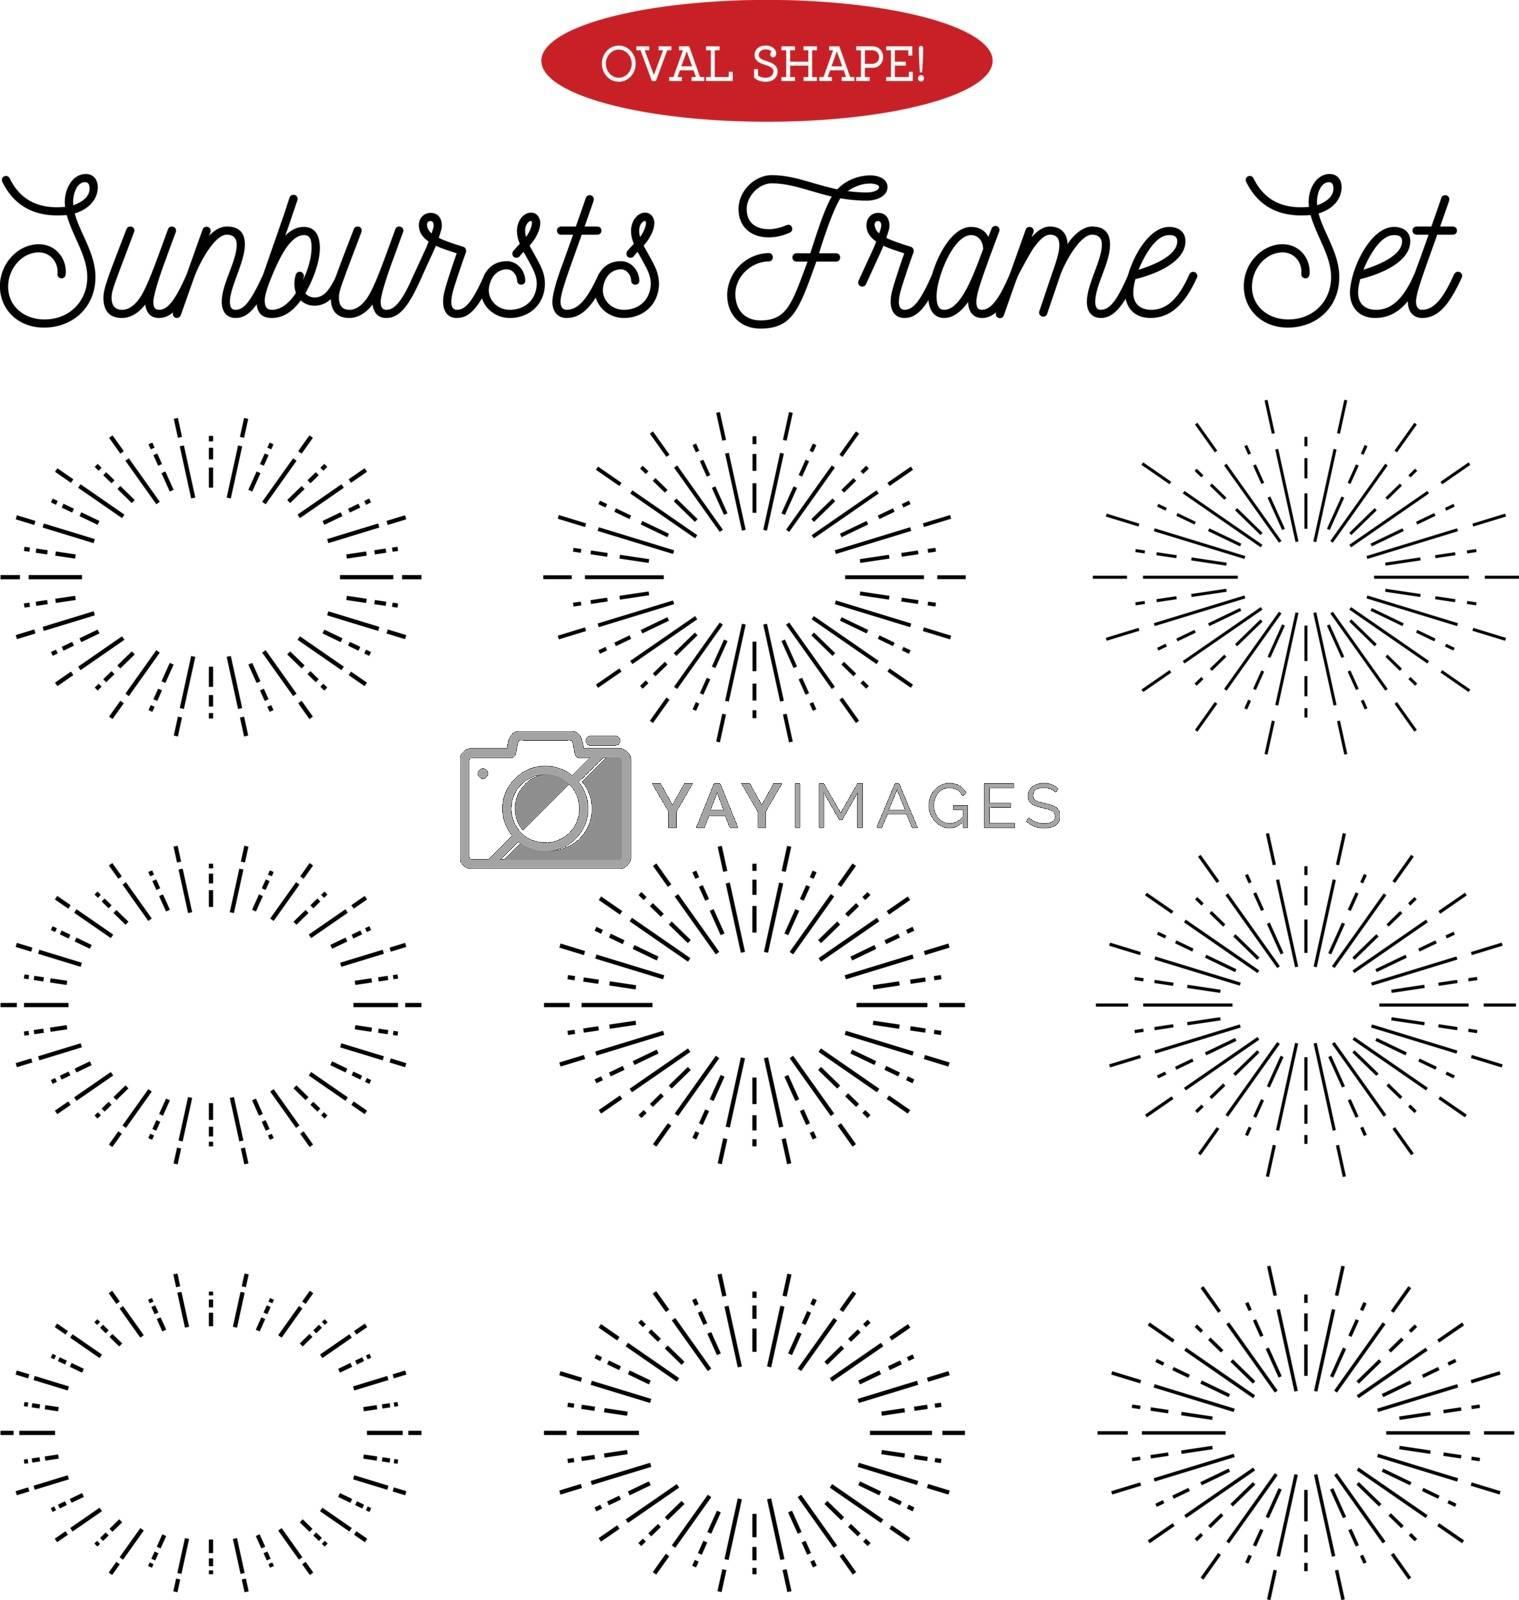 Sunbursts frame set. Oval shape. Vector illustration on white background